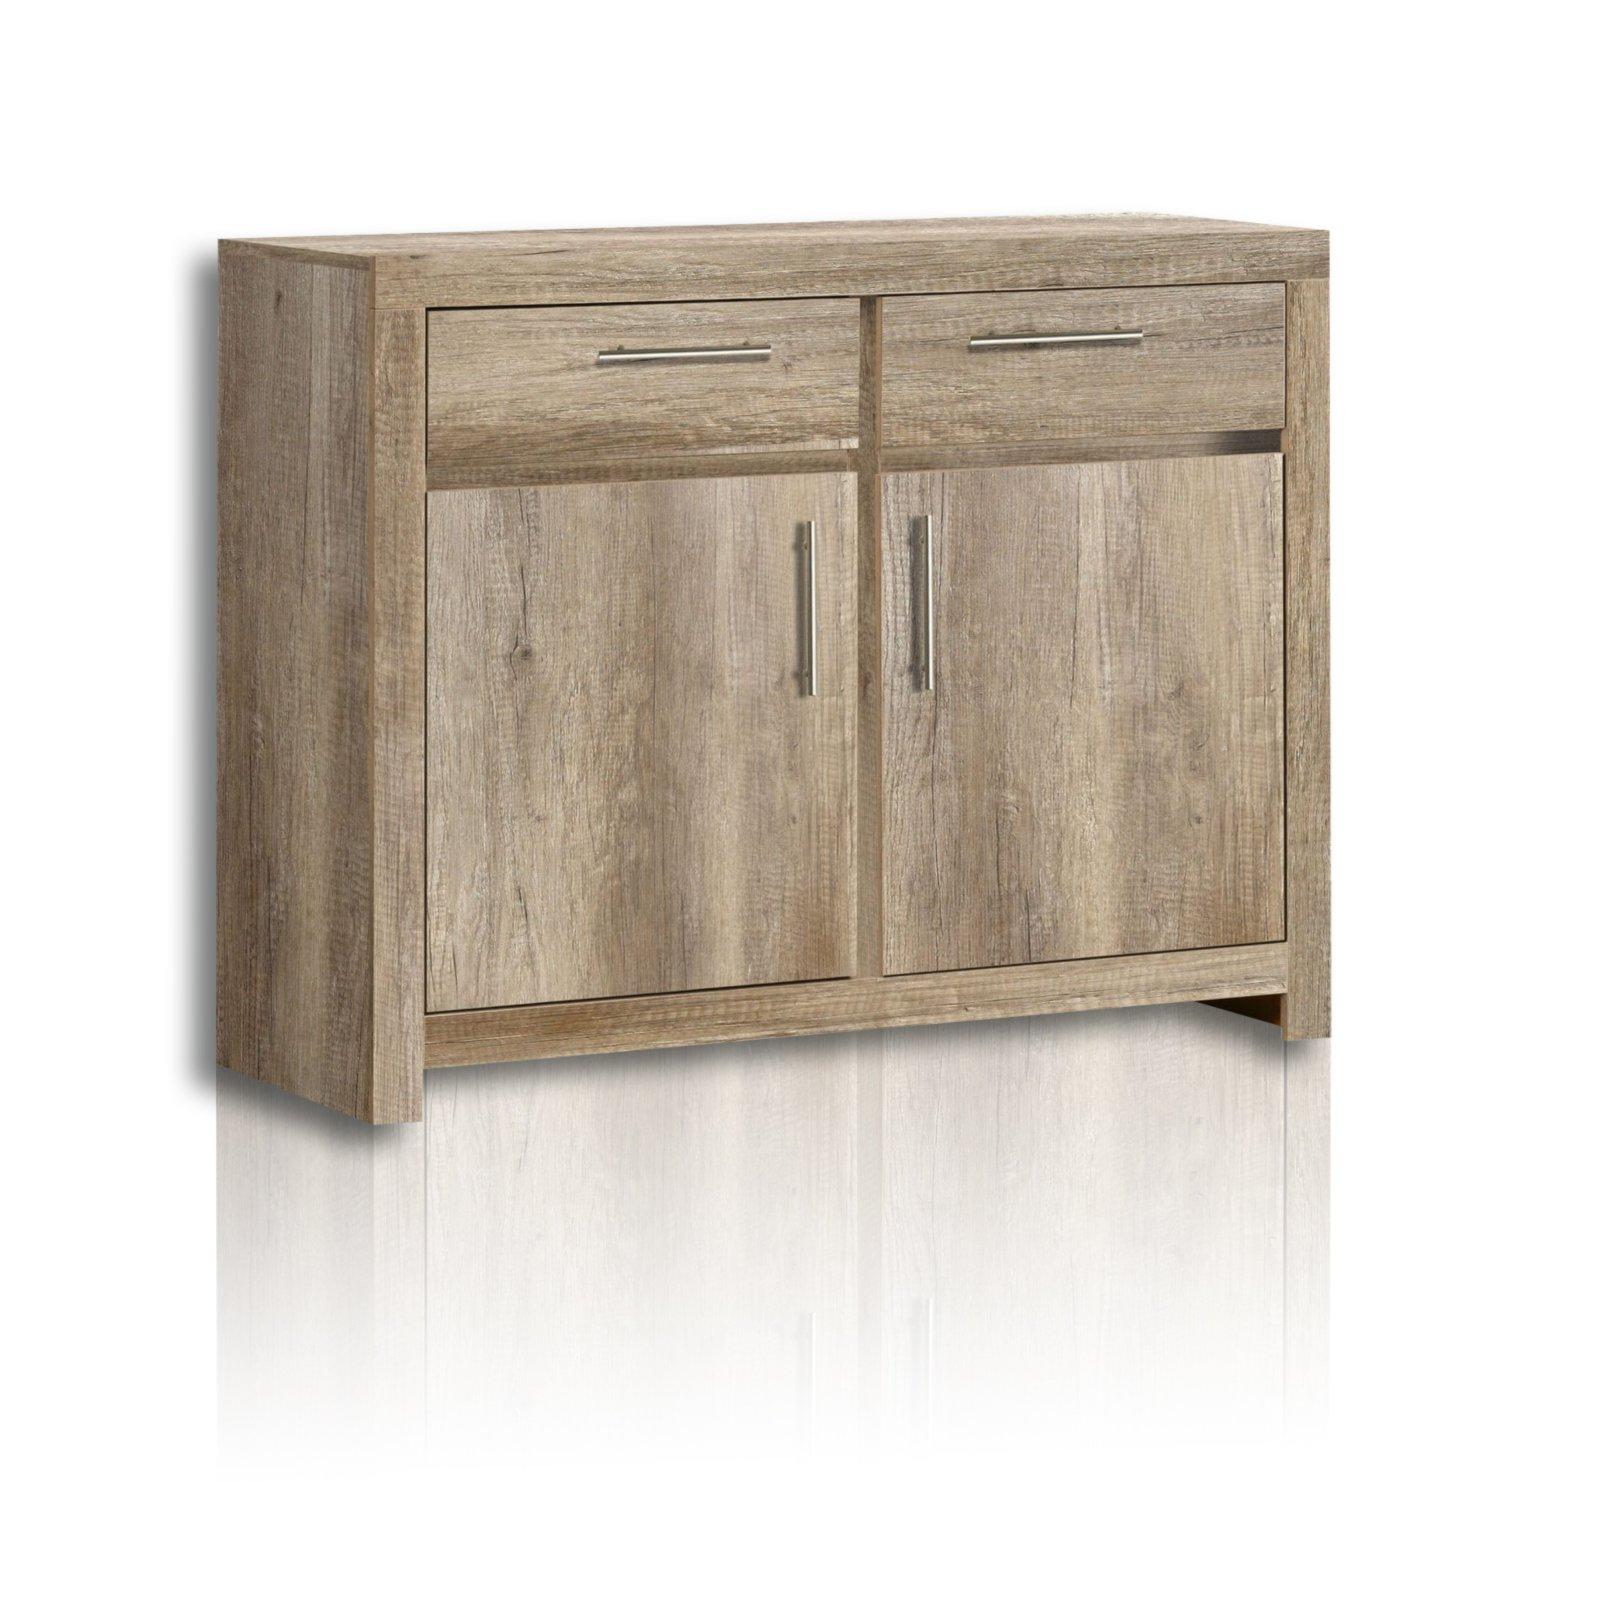 kommode imola eiche antik 113 cm breite kommoden. Black Bedroom Furniture Sets. Home Design Ideas